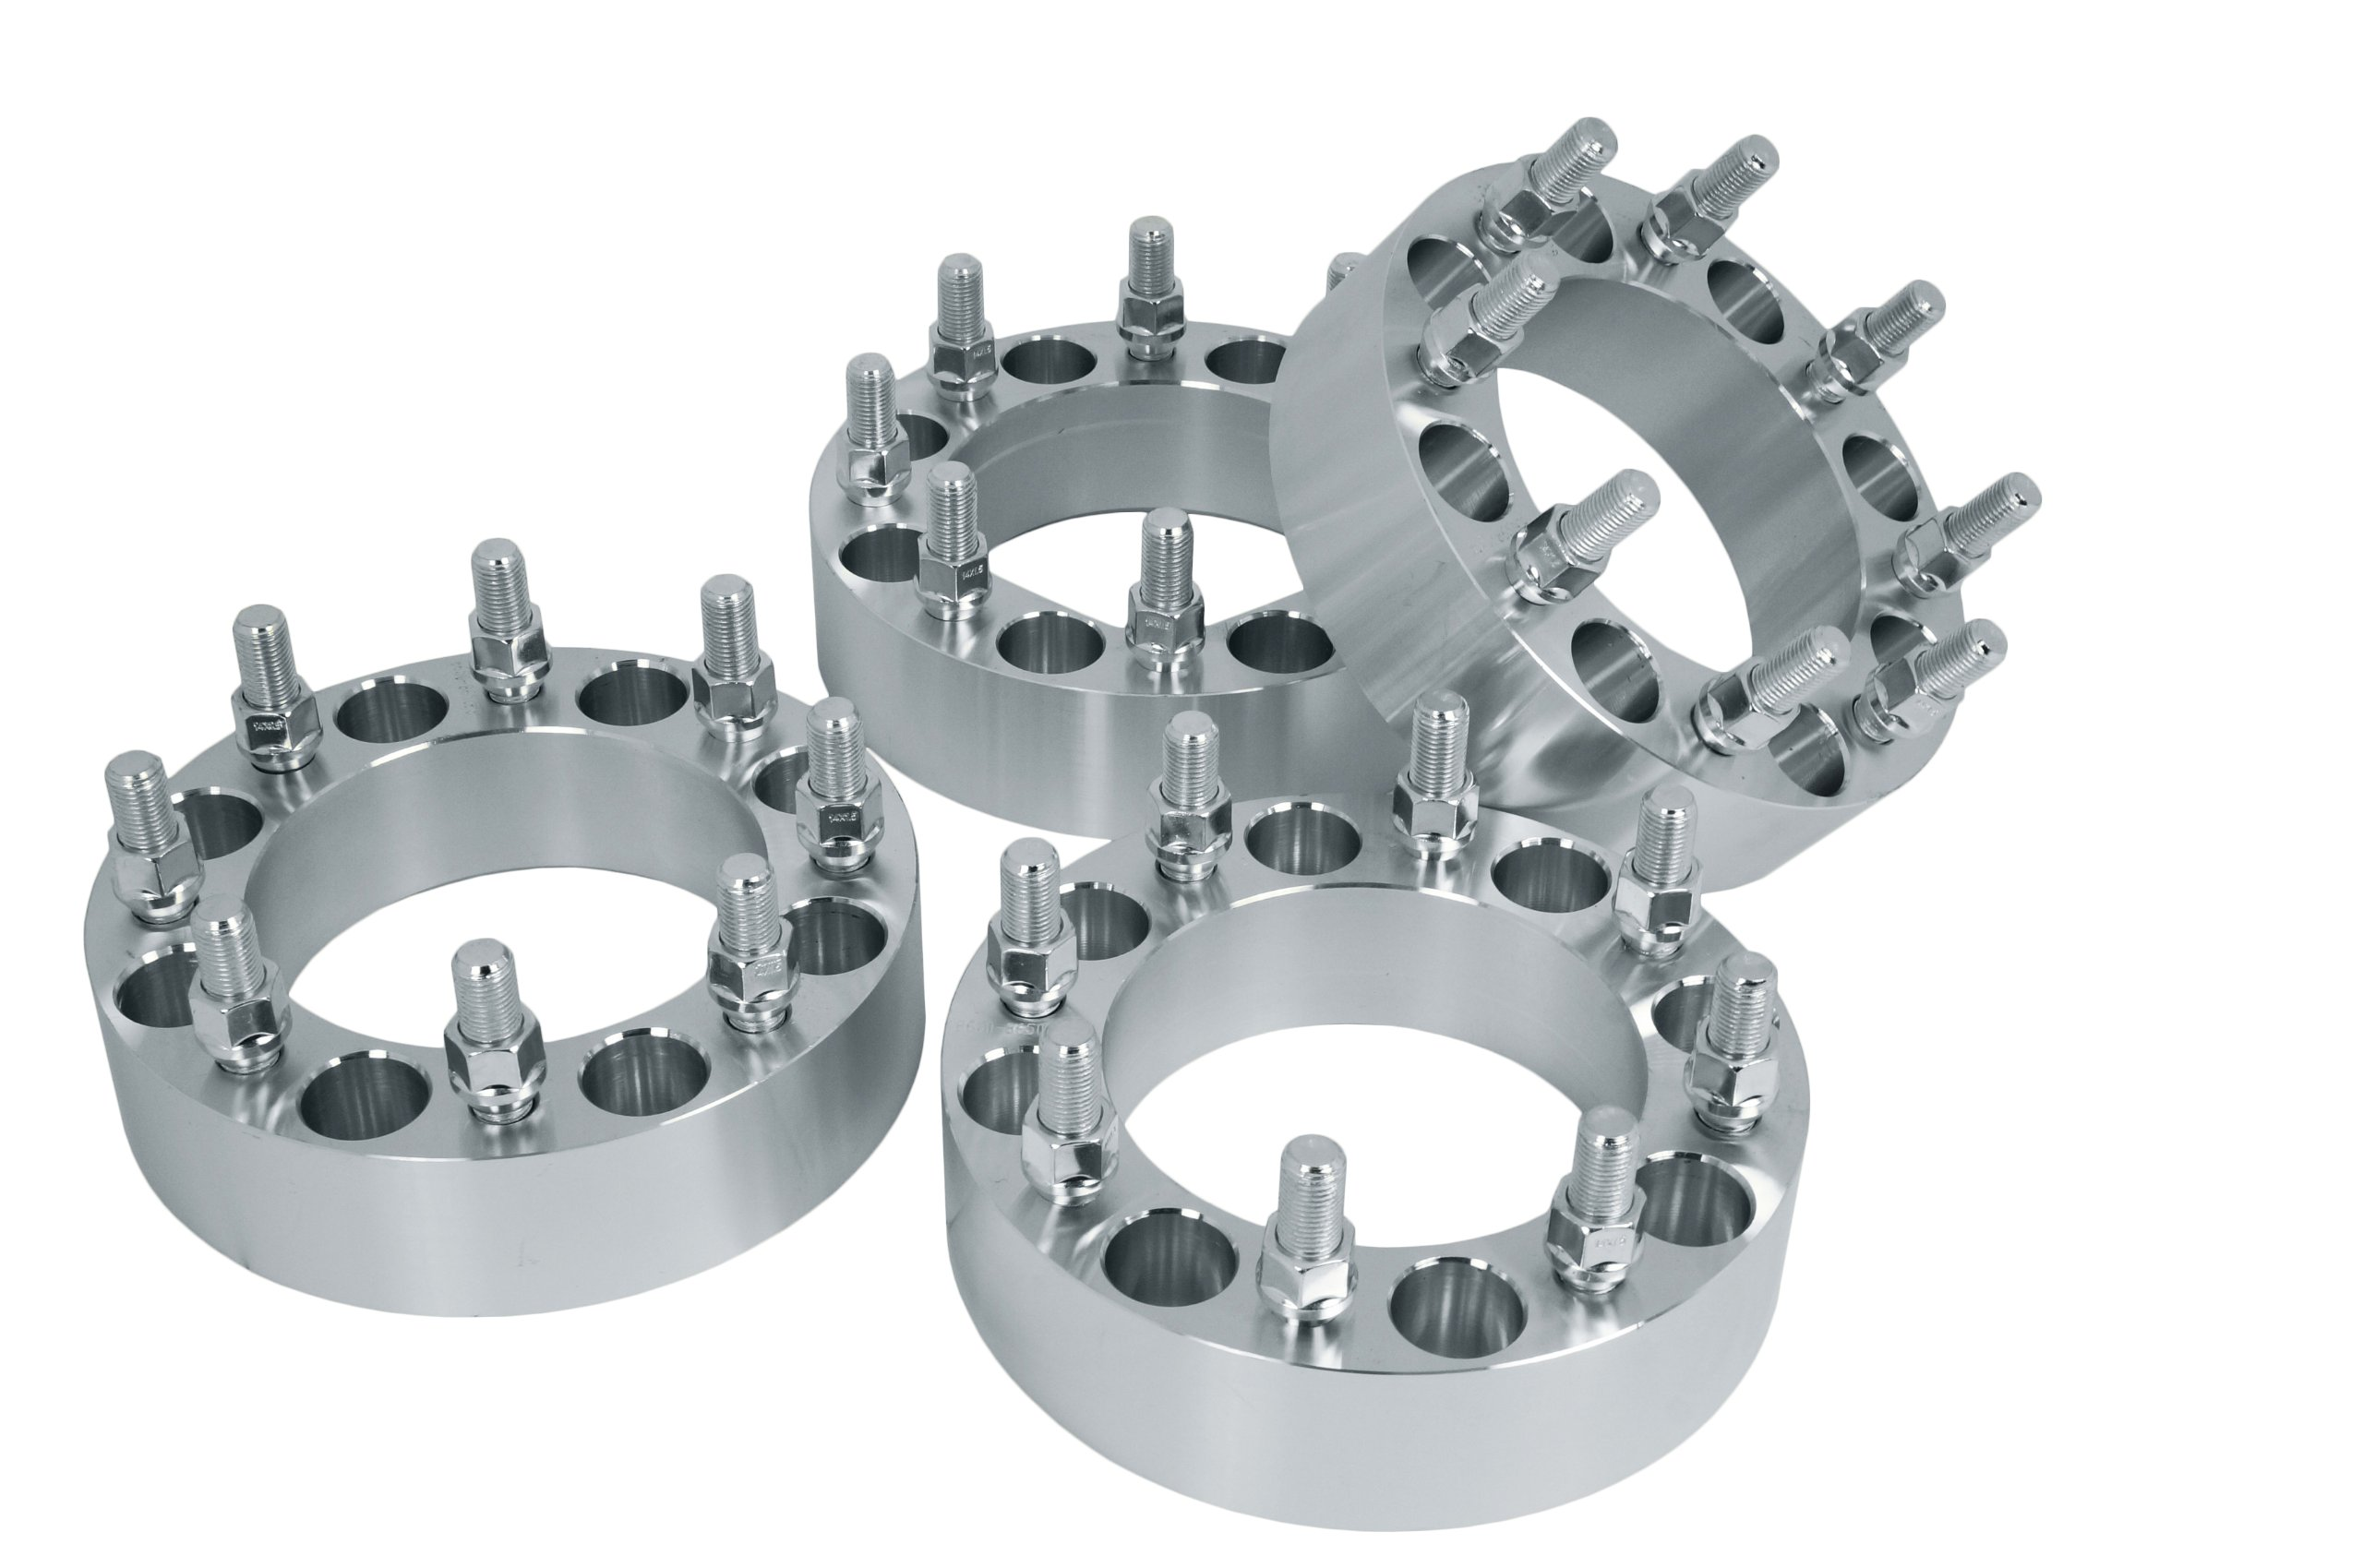 Venom Wheel Accessories VW-81703142-4 4 Pc Billet Forged Wheel Spacers Adapters